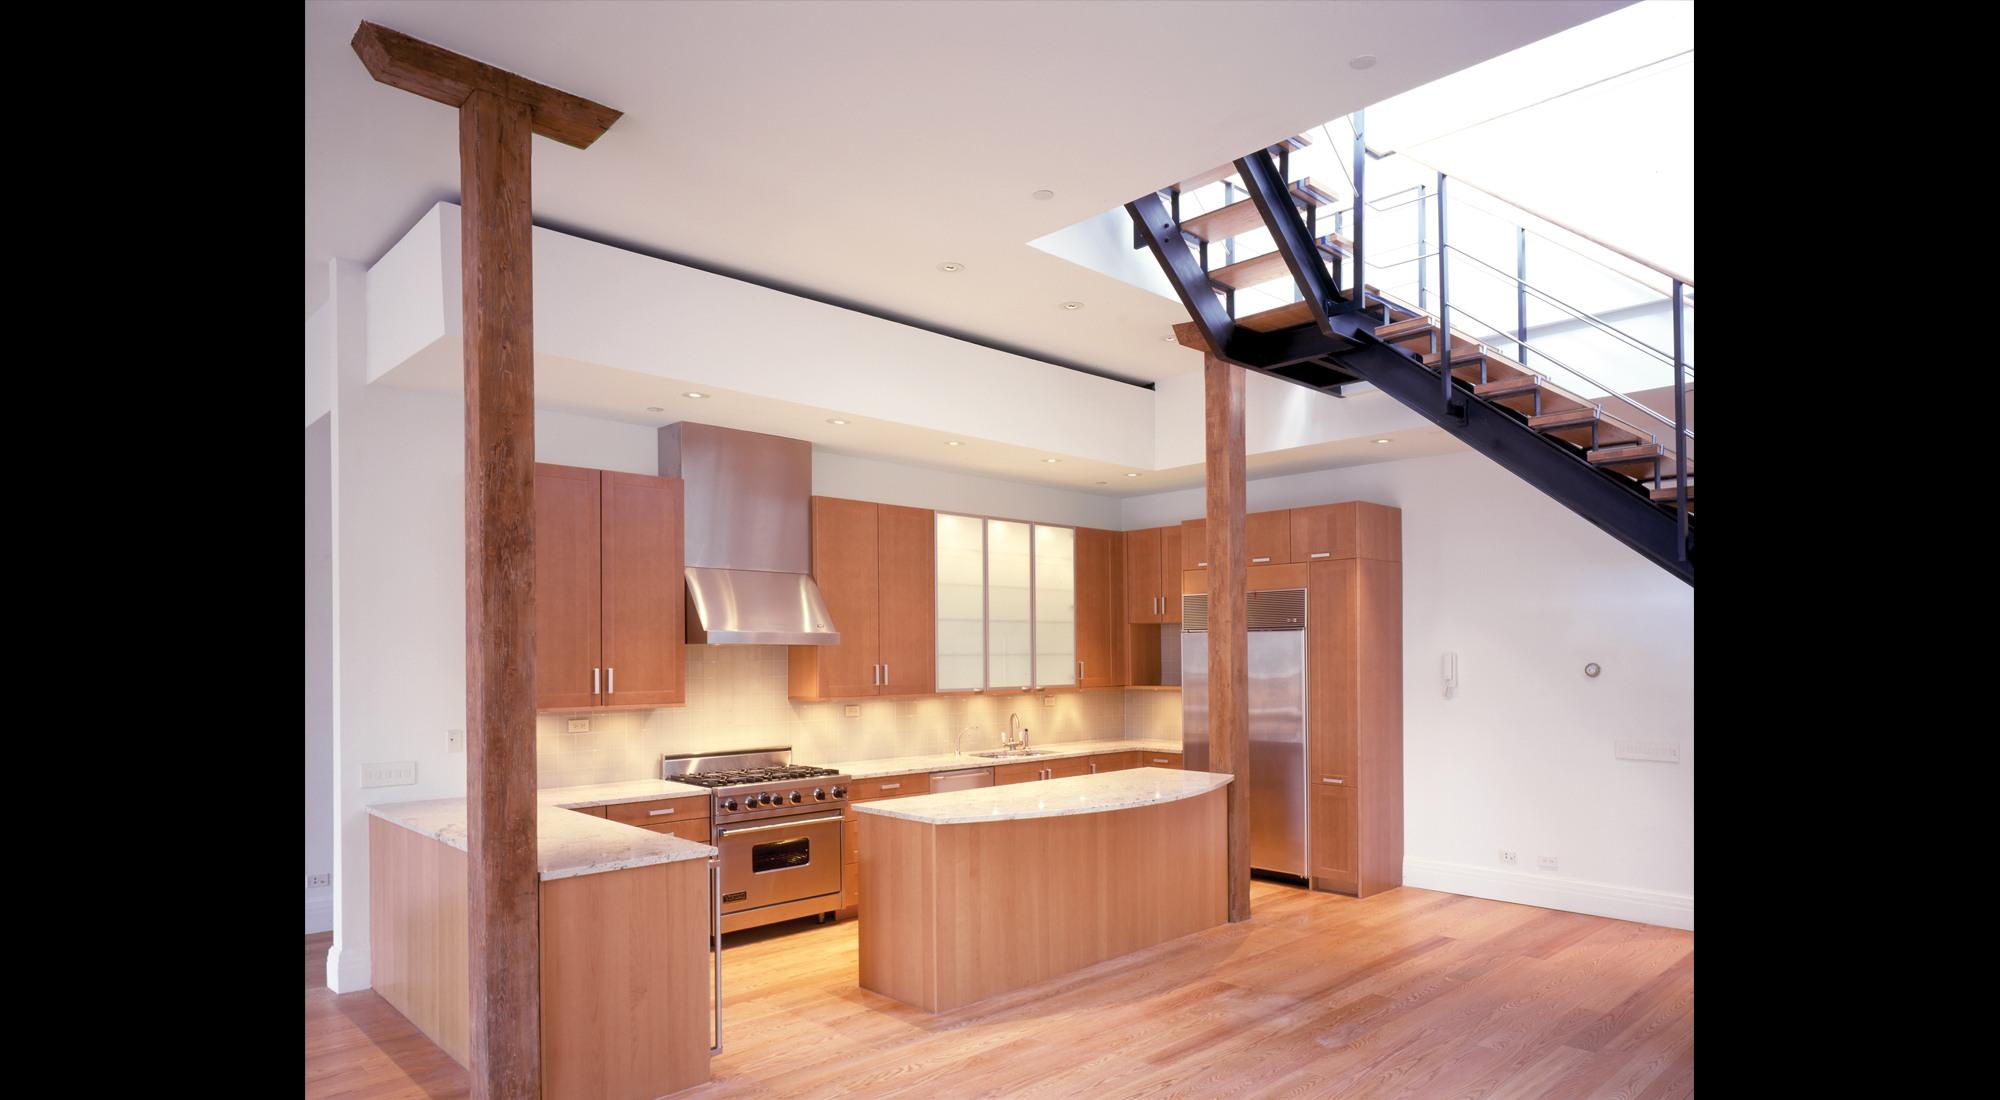 104 Wosoter Kitchen